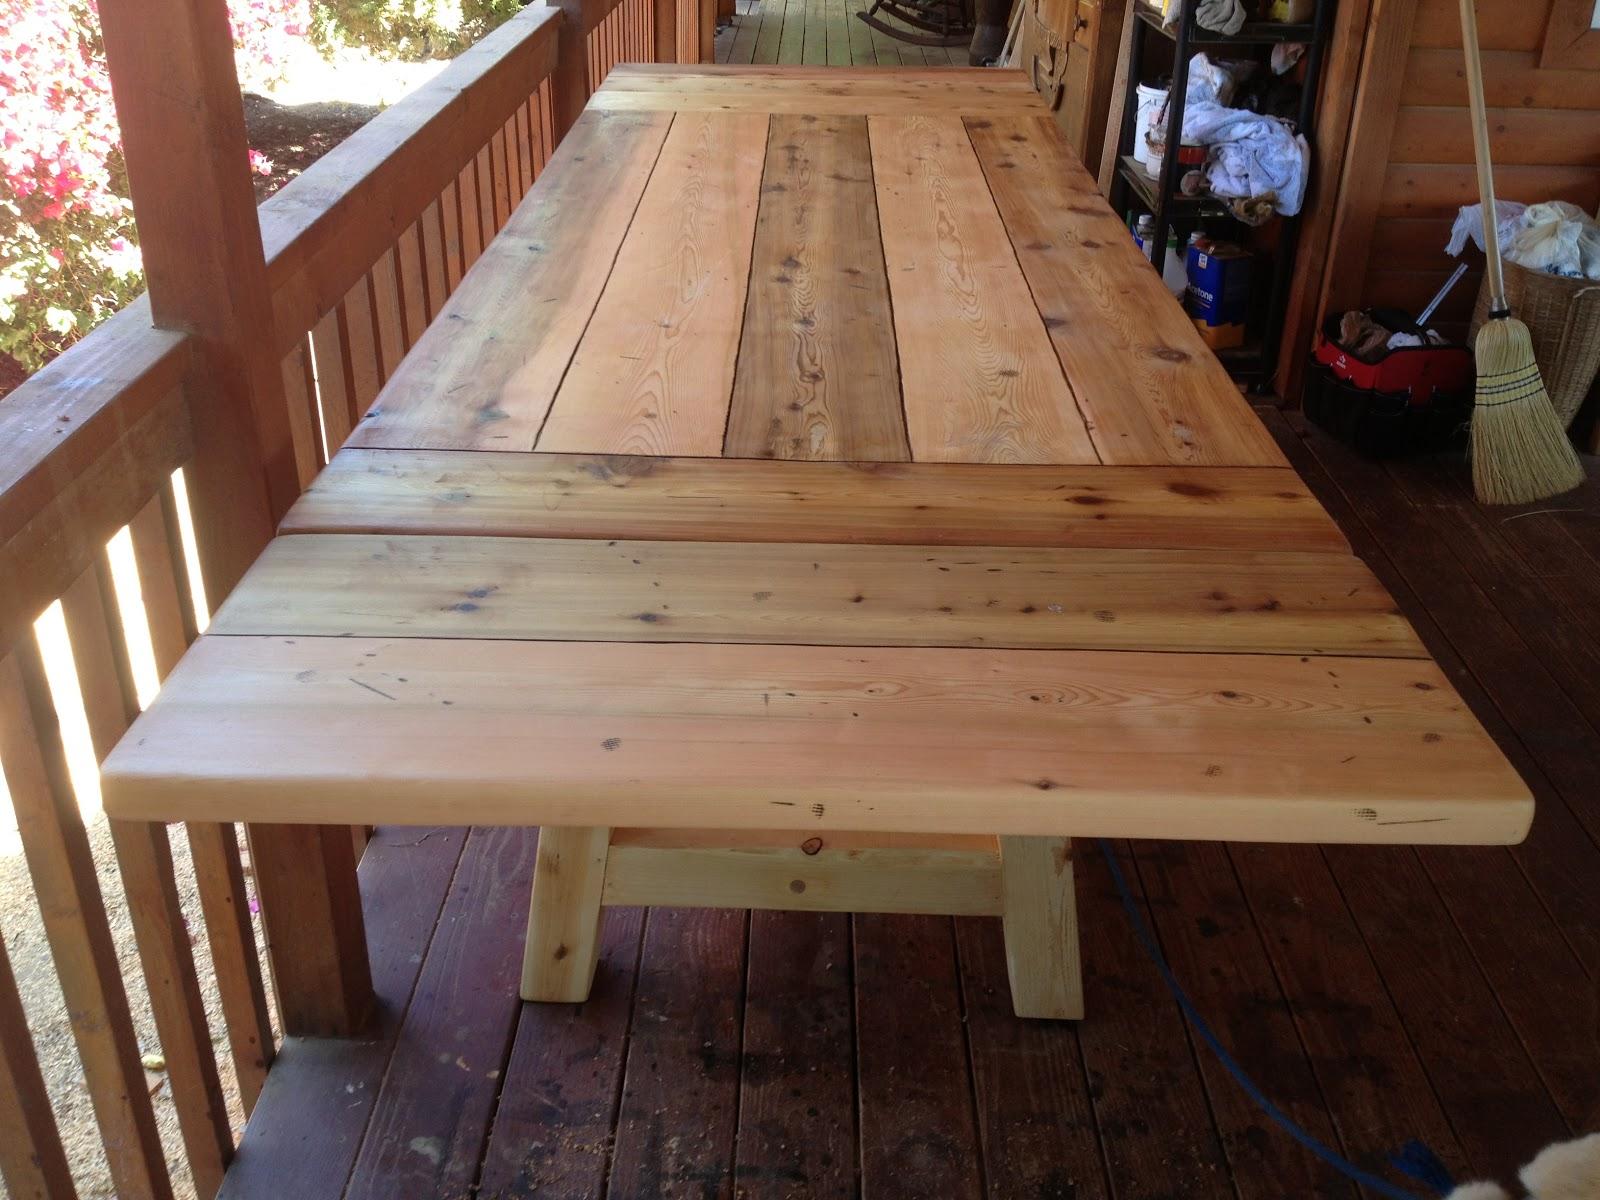 The Polish Carpenter 10 Foot Long Cedar Table With